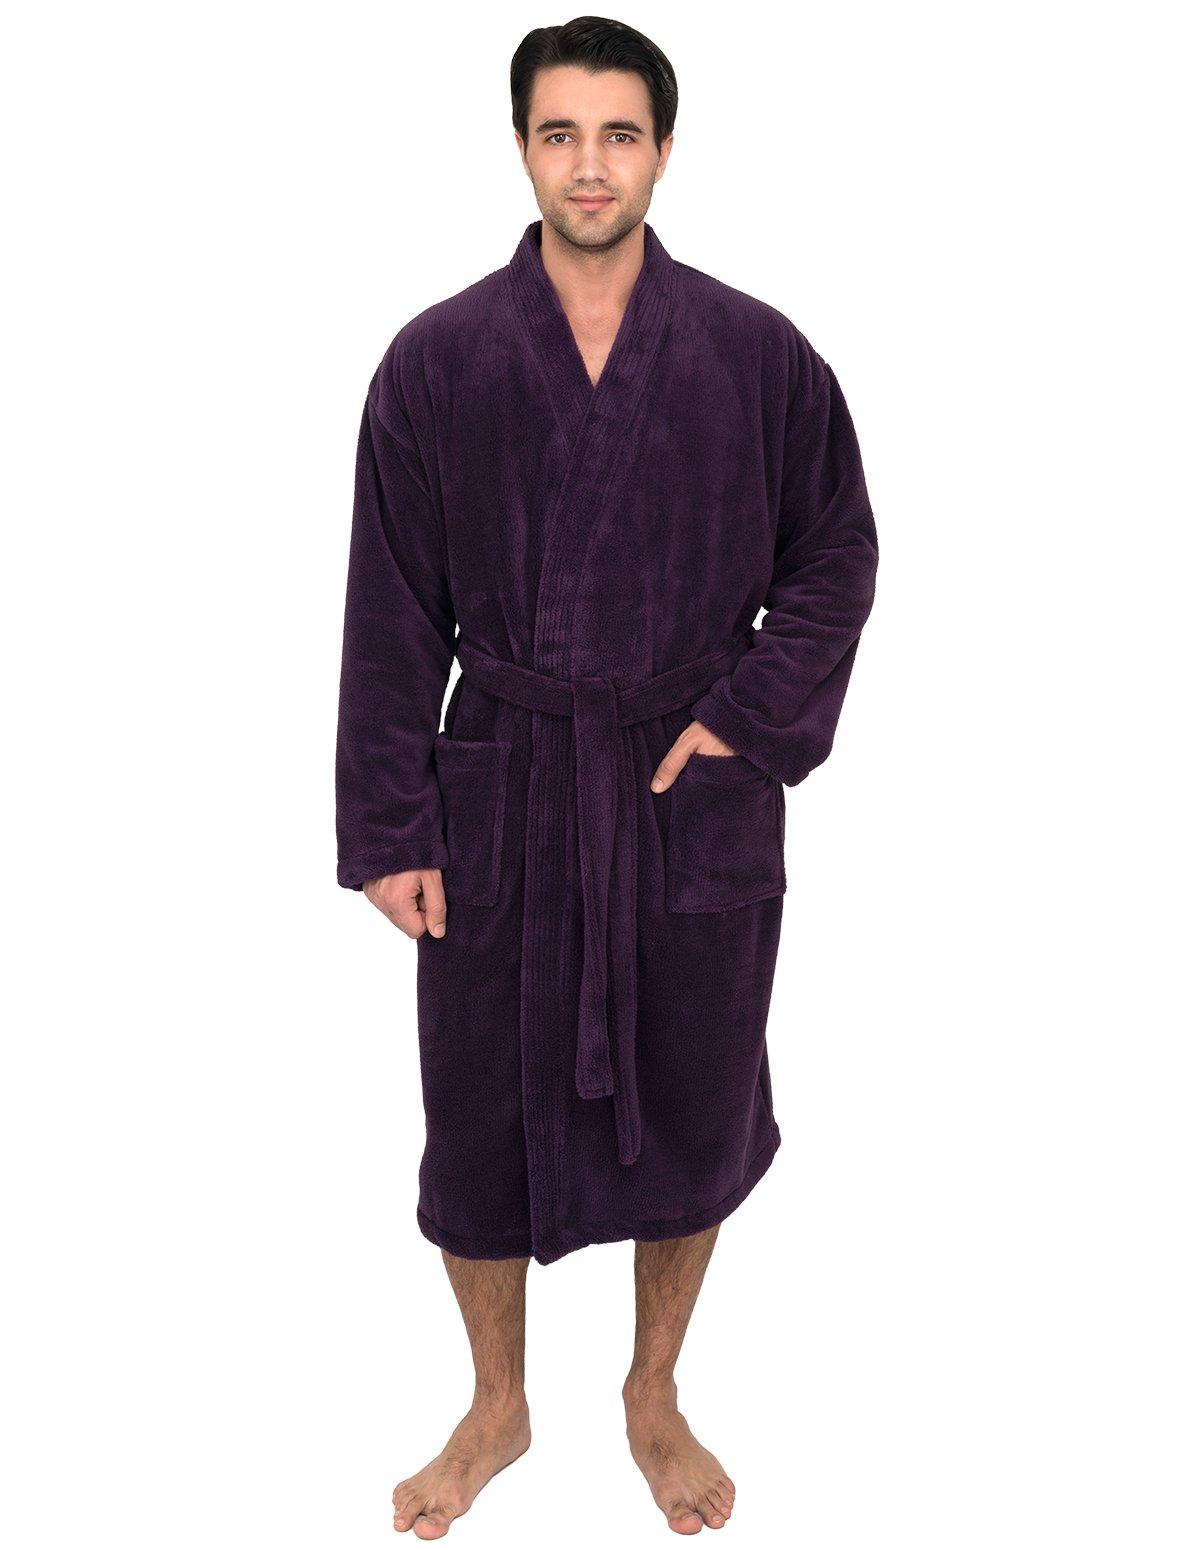 TowelSelections Super Soft Plush Kimono Bathrobe Fleece Spa Robe for Men Small/Medium Wine Berry